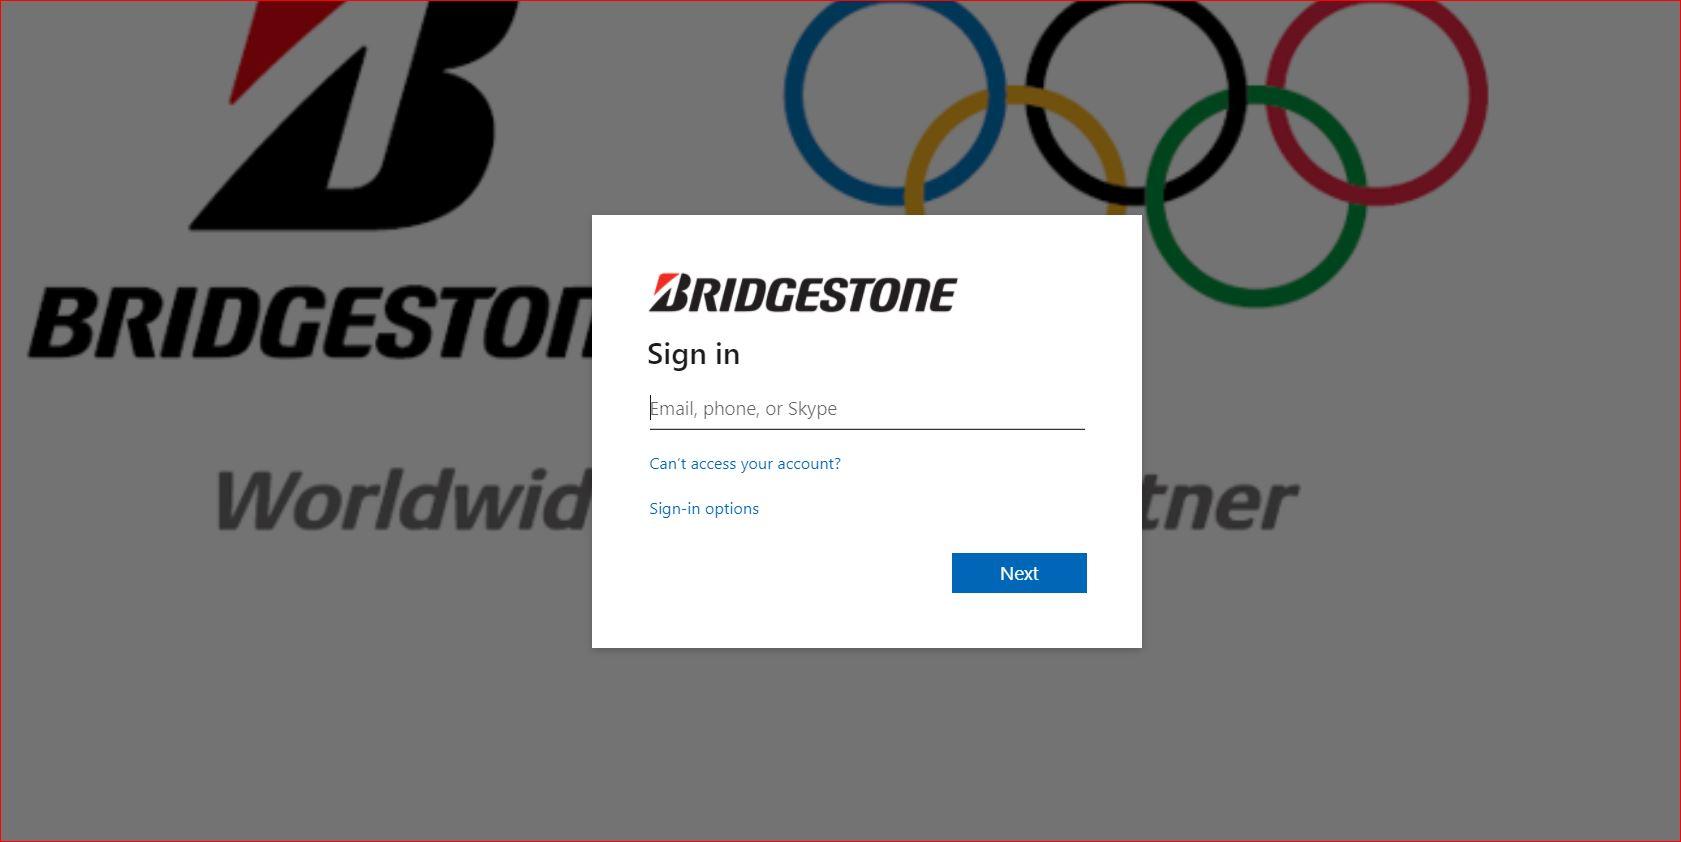 Bridgestone myhr